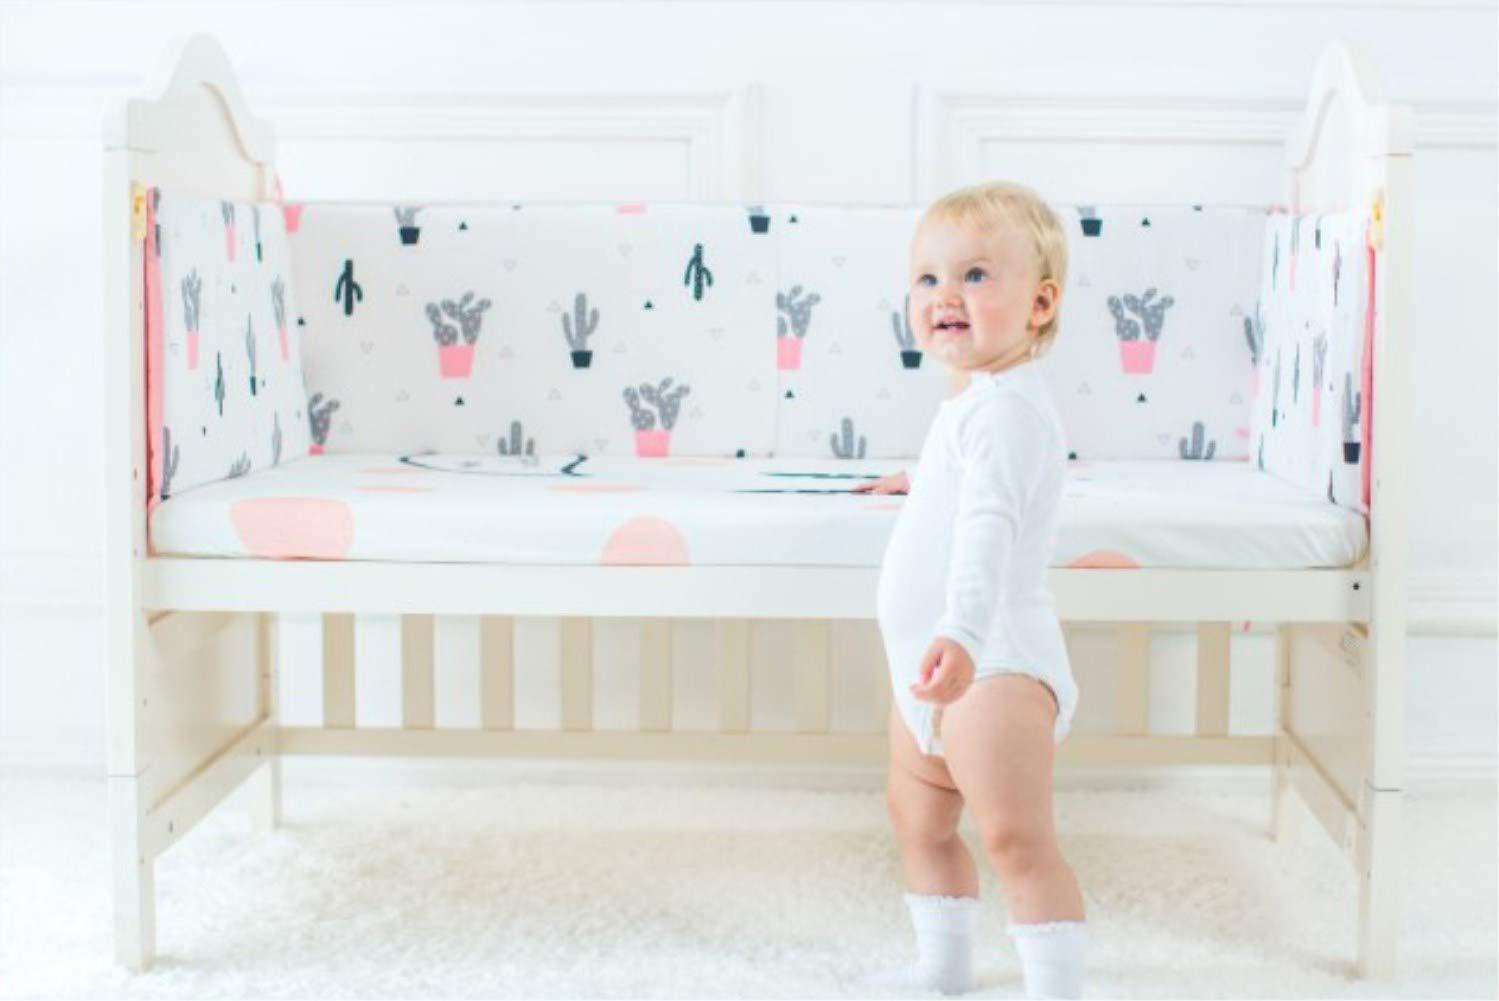 DDLL Protectores Para Cunas Y Camas De Beb/é Cuna Valla Bumper Baby Bed Baby Children Pillow Infant Cotton Coj/ín Kids Room Decoration Juguetes